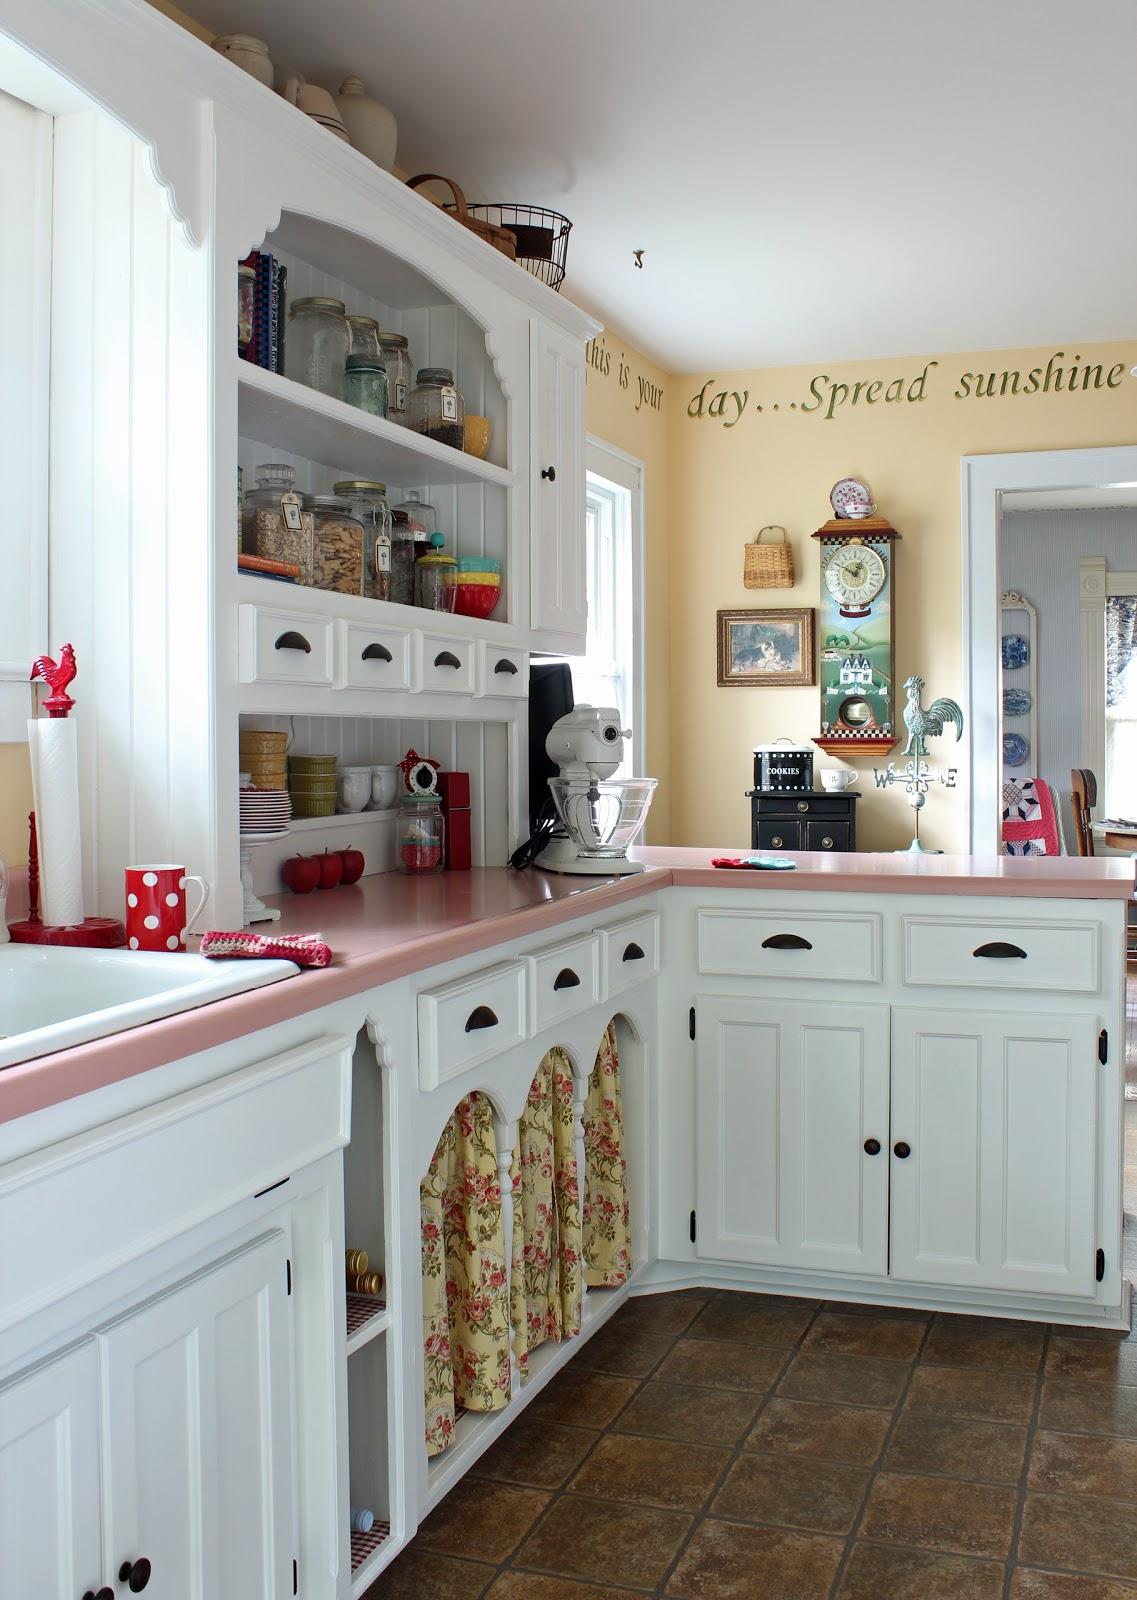 Pink Countertops Kitchen Ceramic Tile Catherine Holman Folk Art Living With